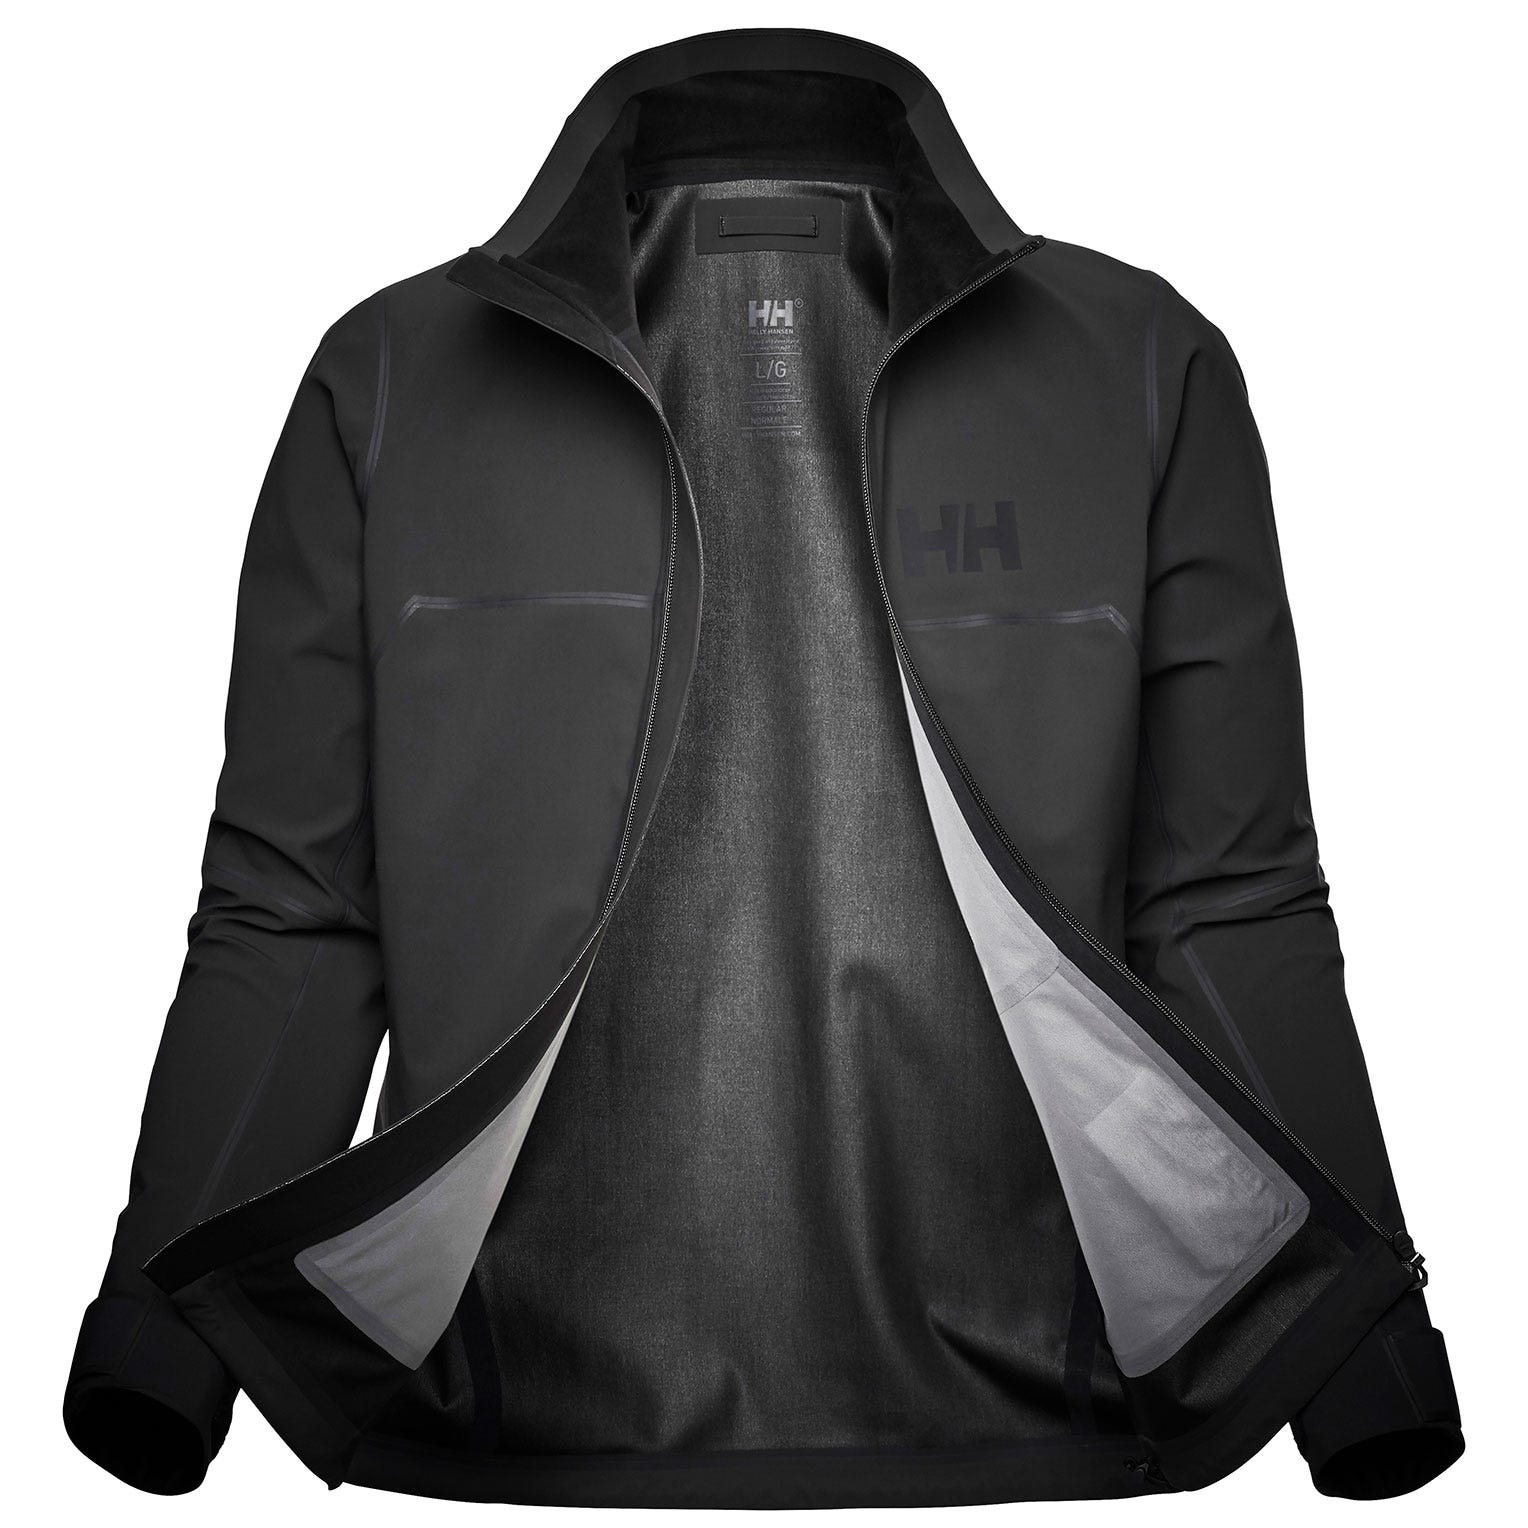 Helly Hansen Mens Foil Pro Softshell Waterproof Jacket Grey XXL